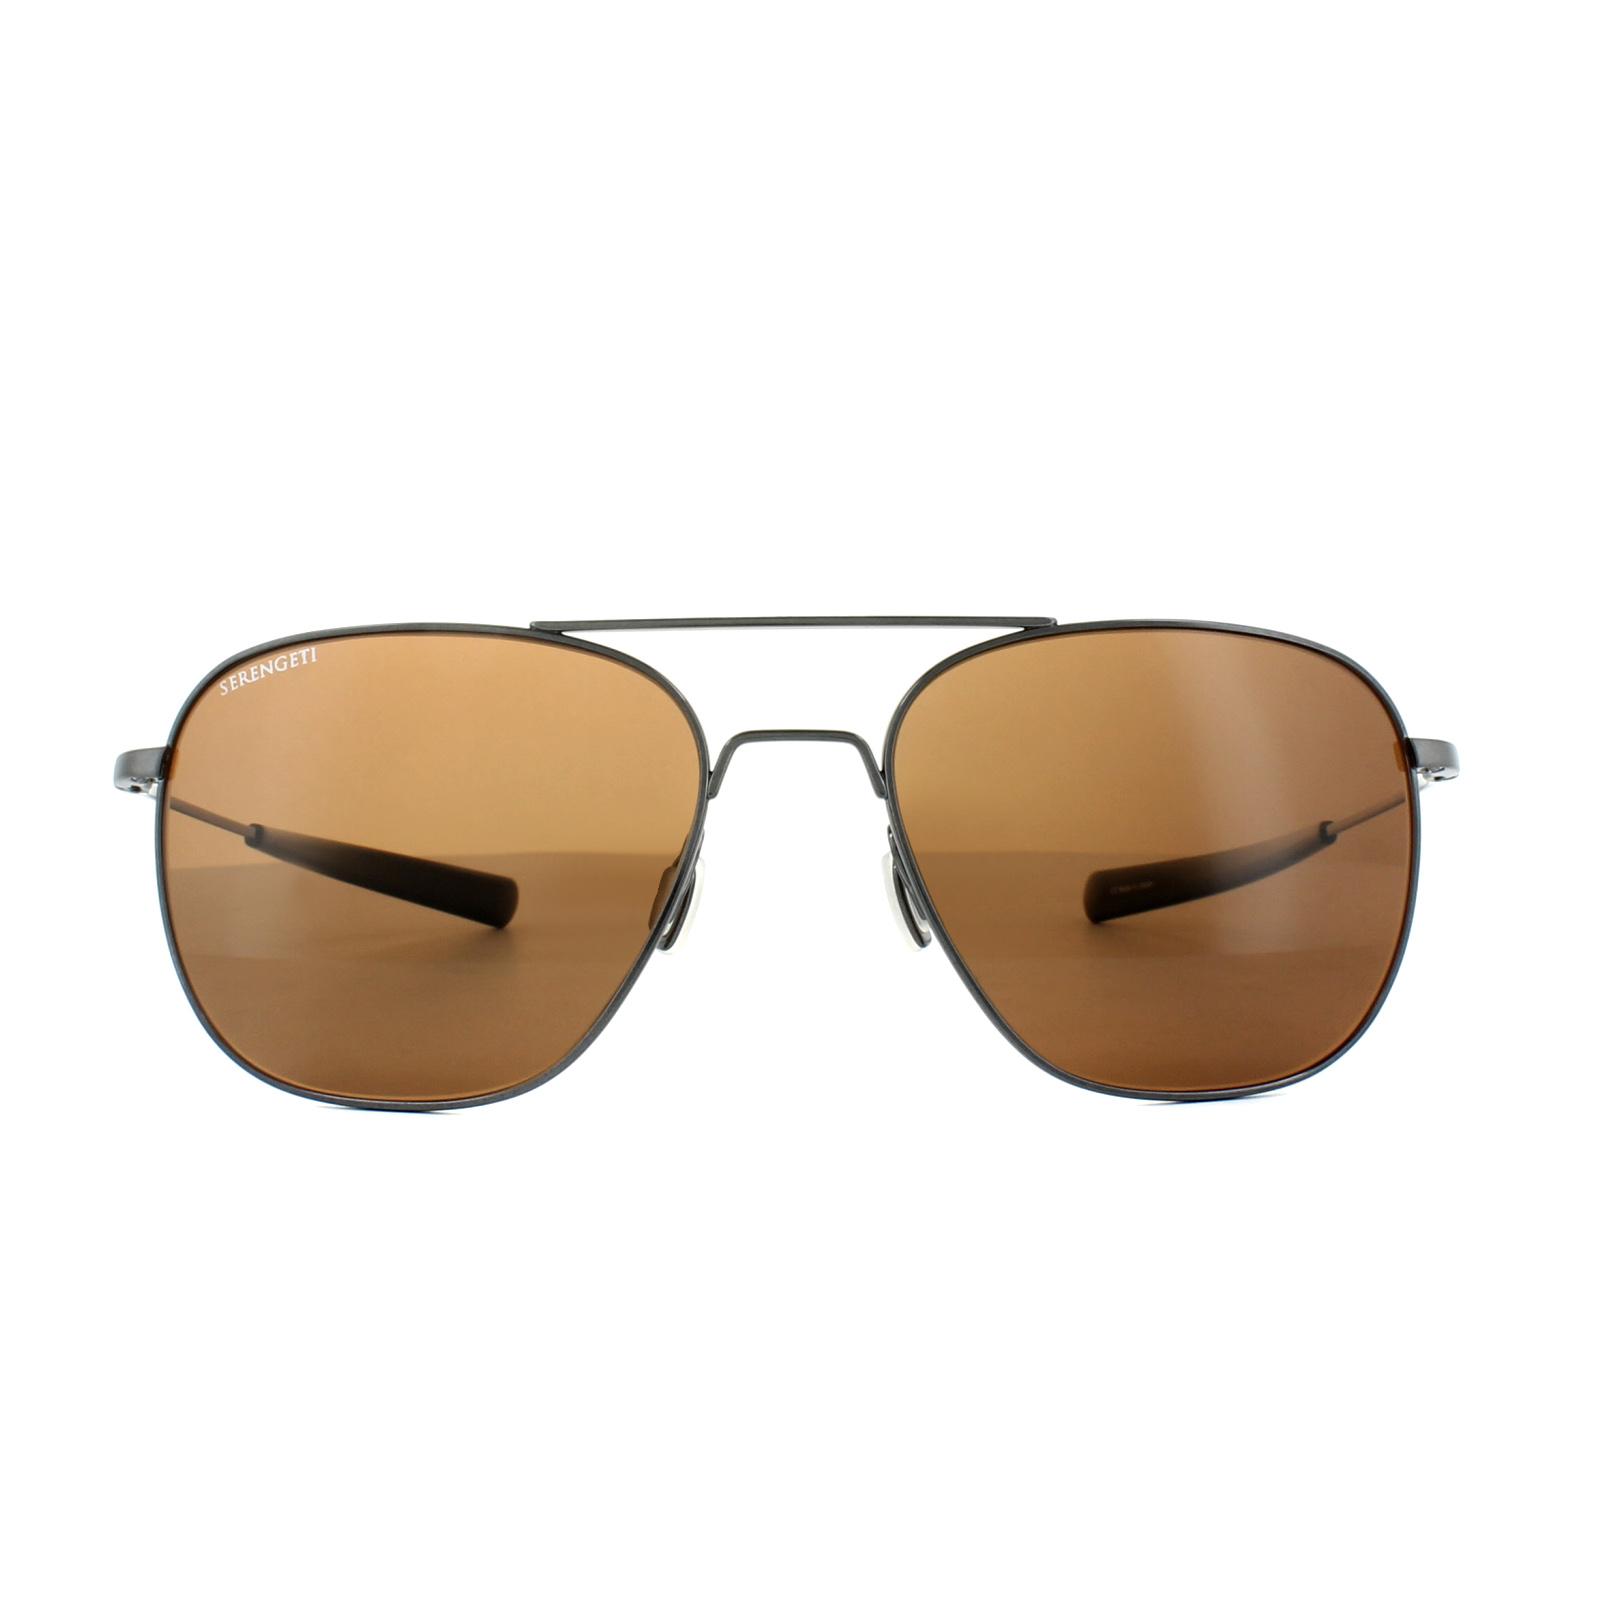 397e72b232a Sentinel Serengeti Sunglasses Aerial 7979 Shiny Hematite Drivers Brown  Polarized